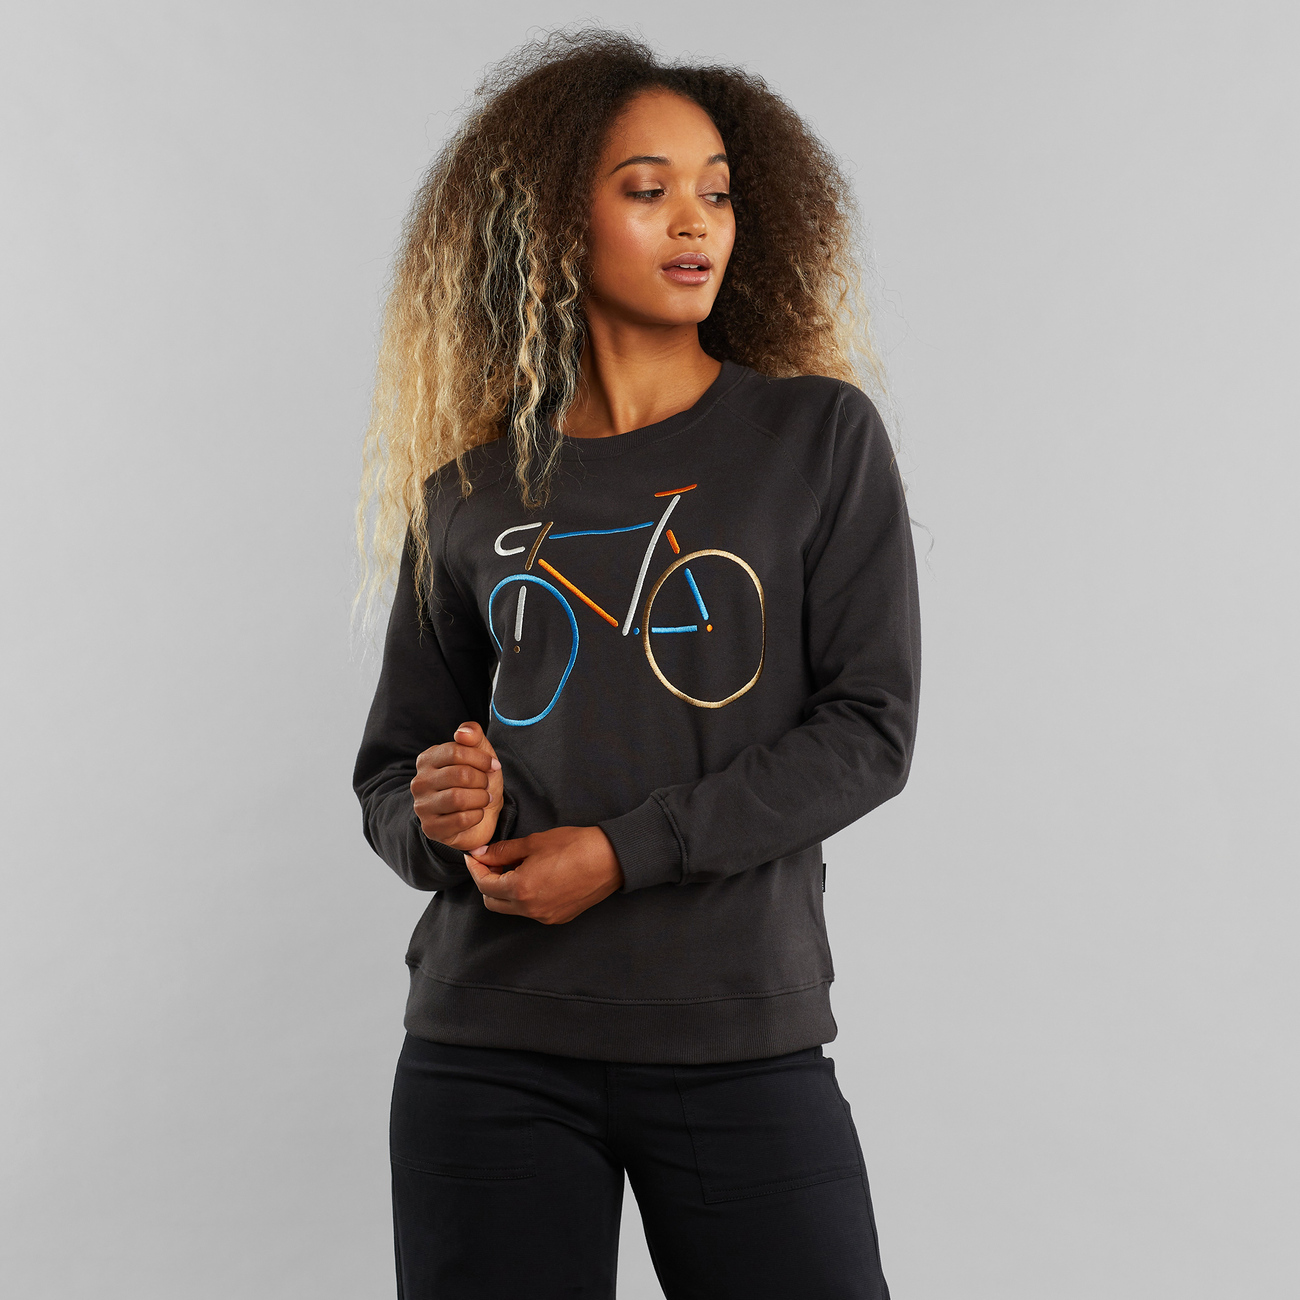 Sweatshirt Ystad Raglan Color Bike Charcoal